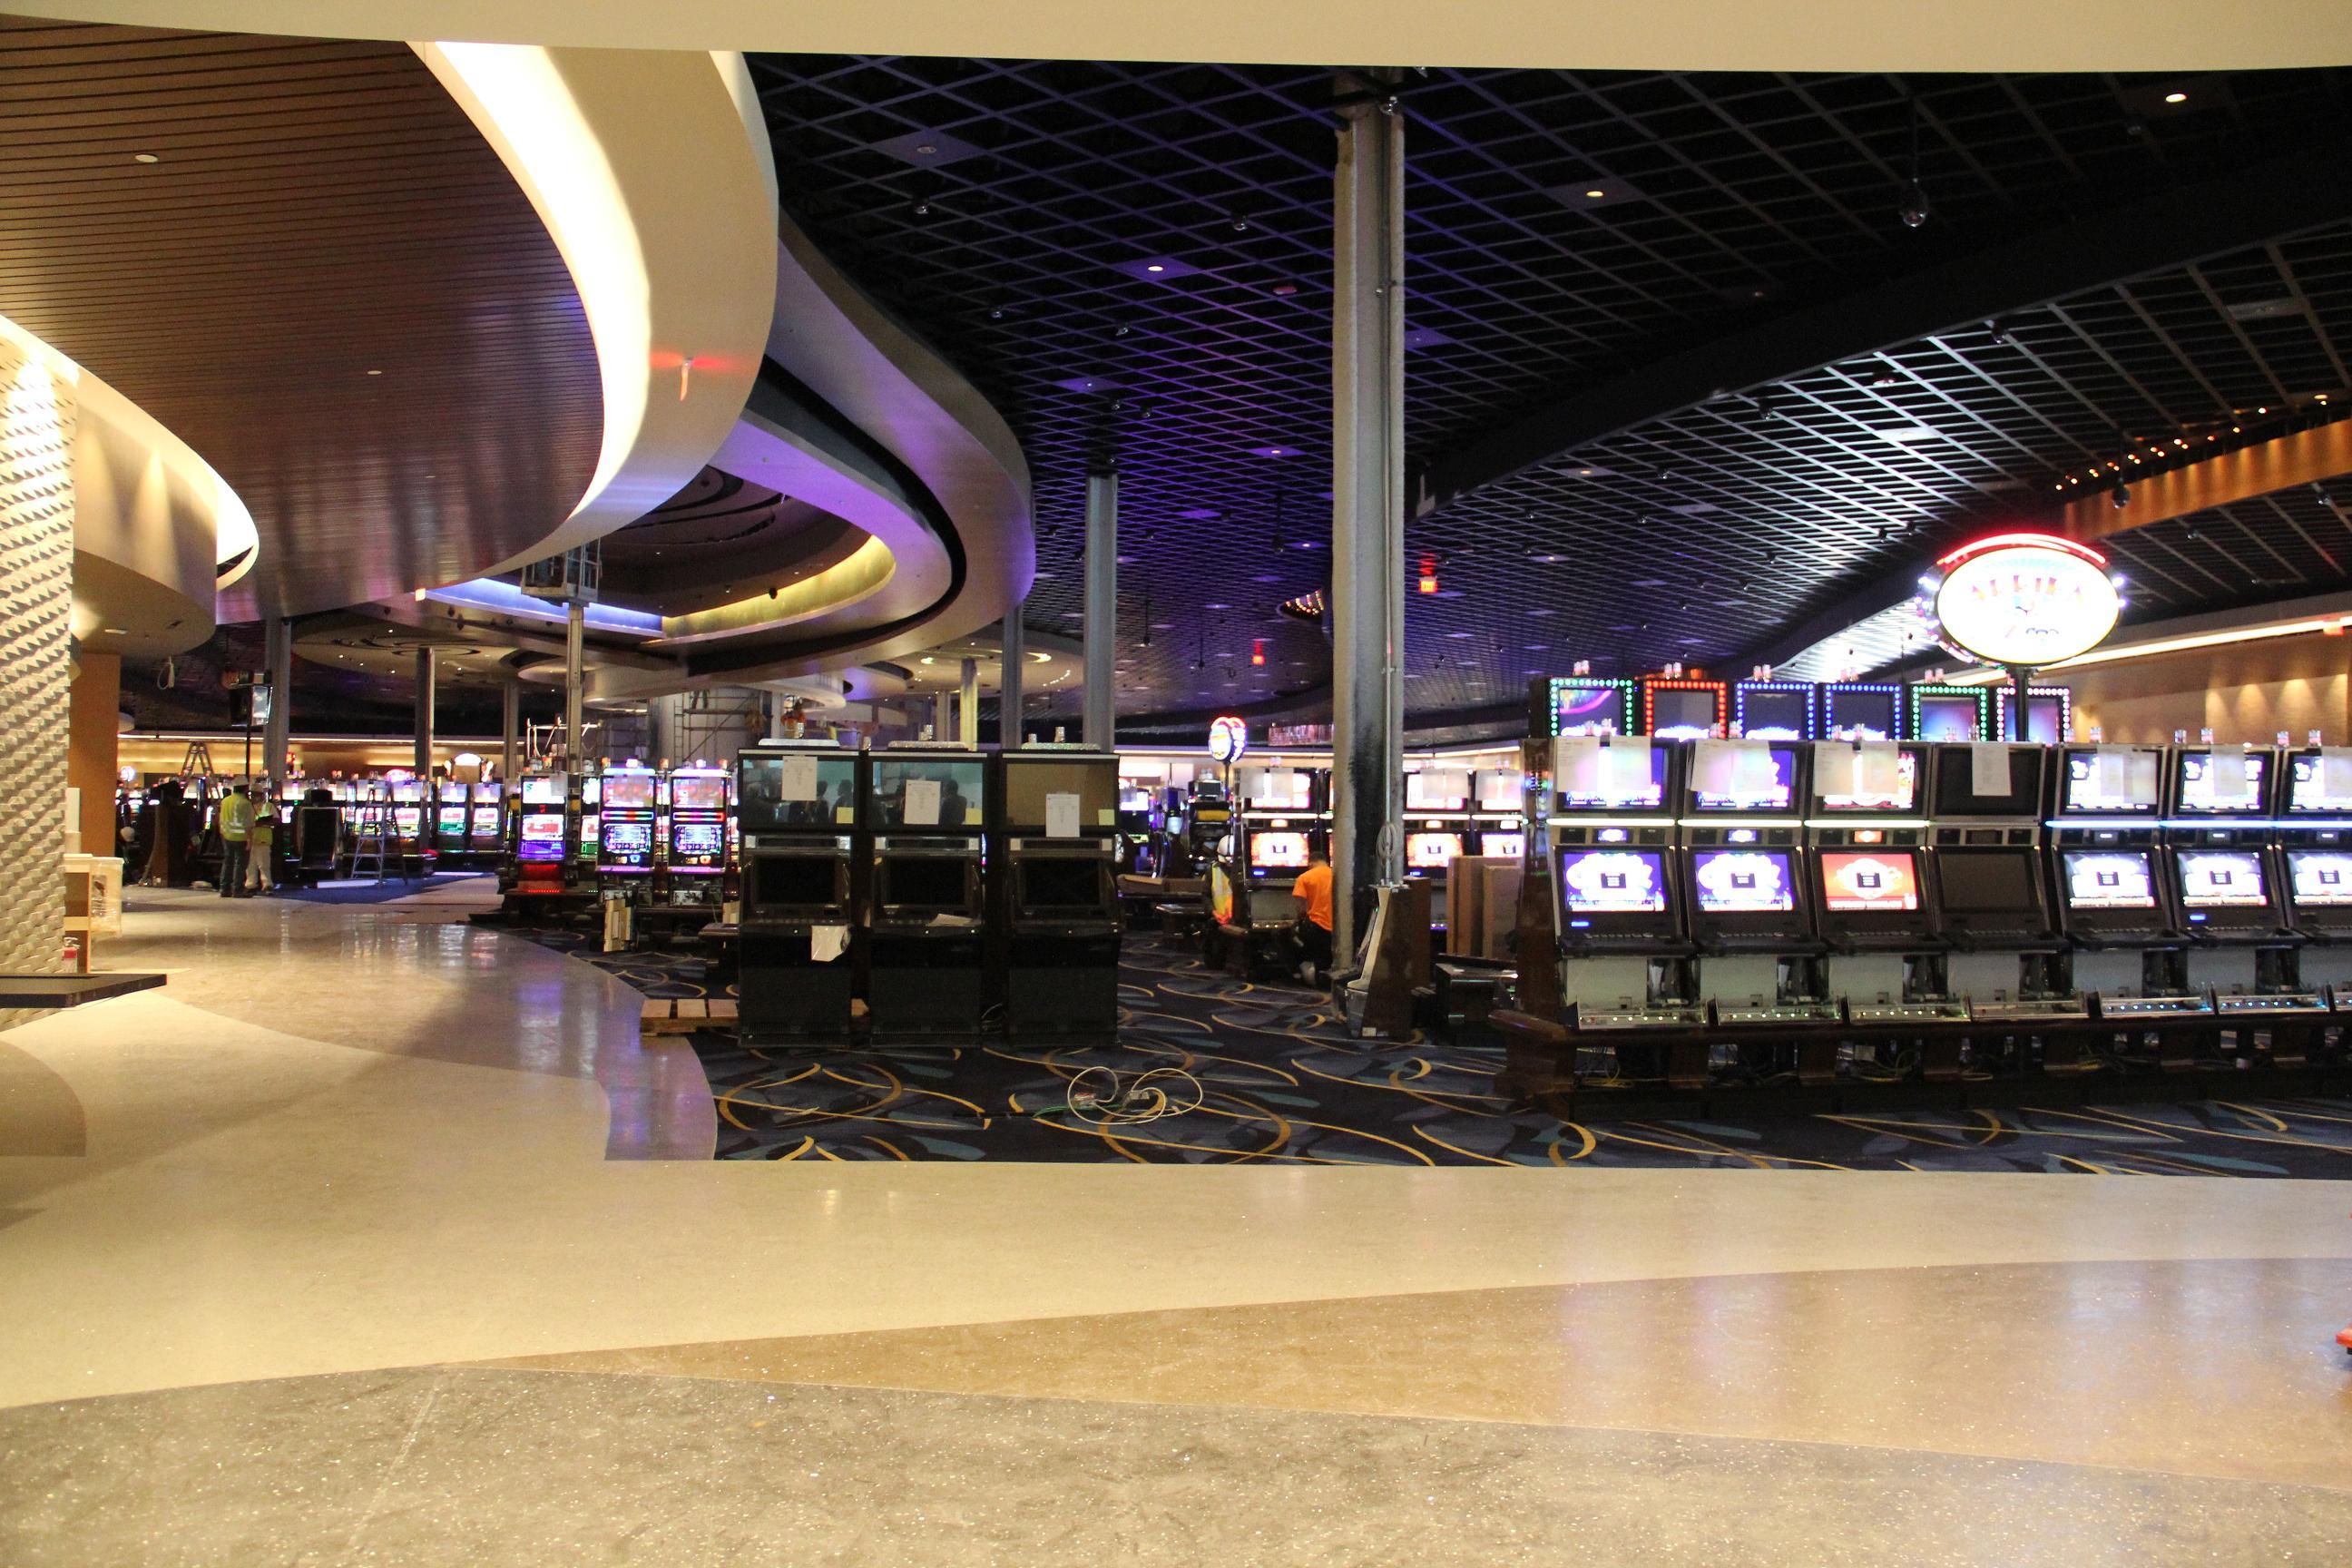 Casino floor construction pitg gambling majestic star